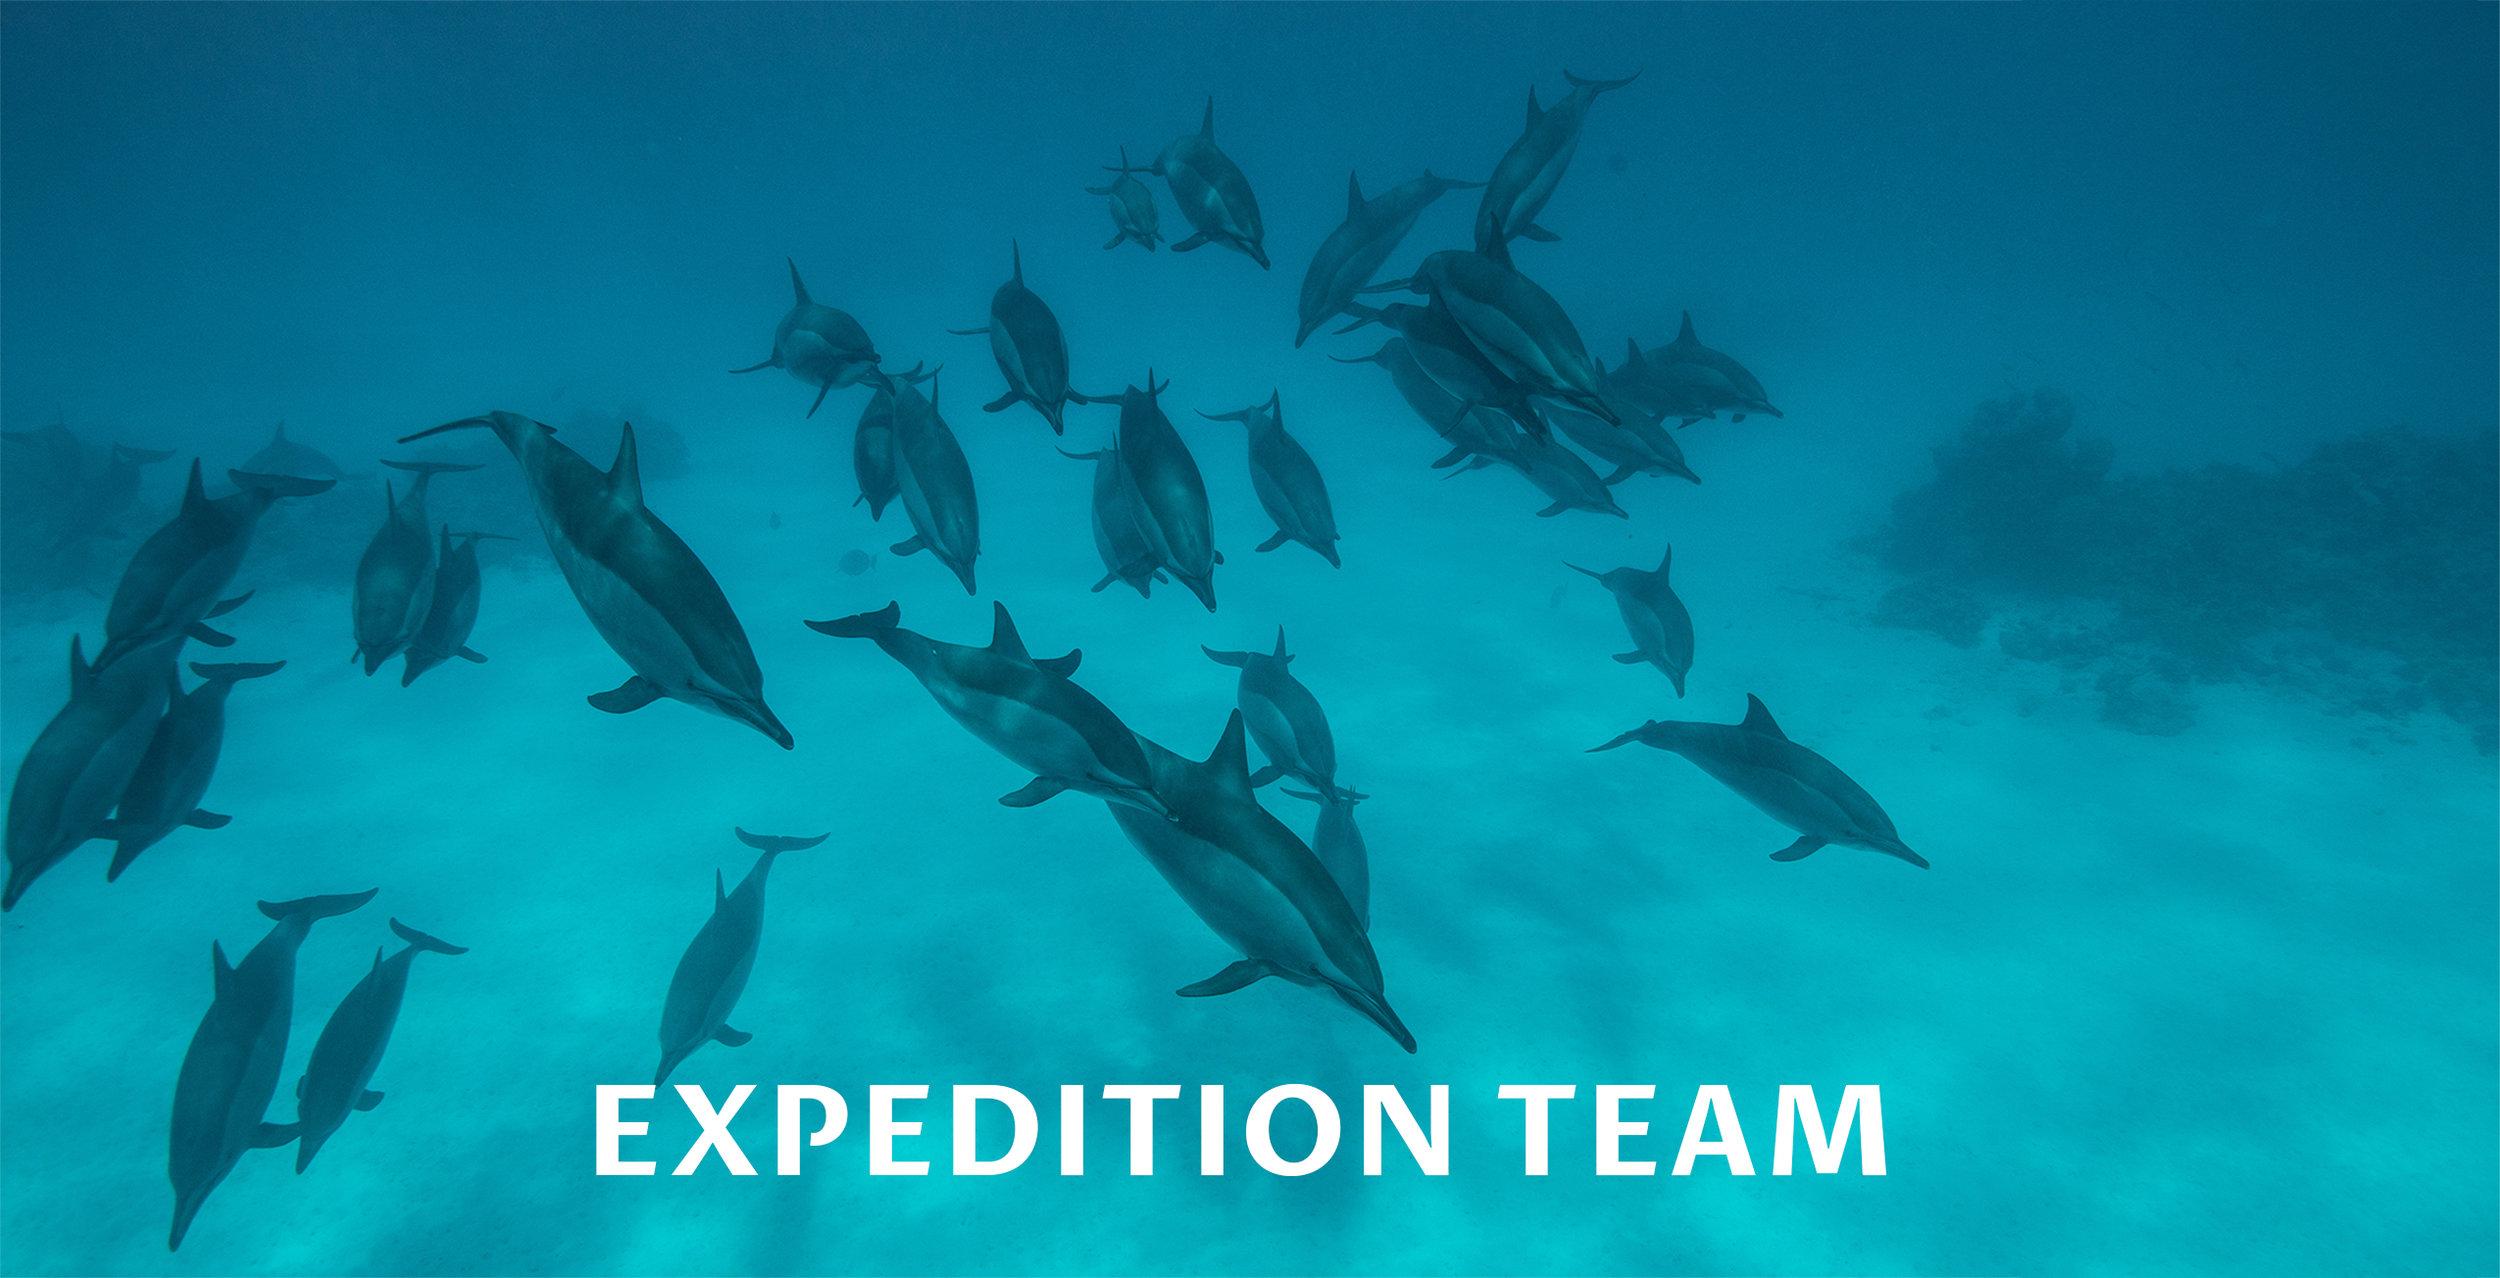 Team-.jpg